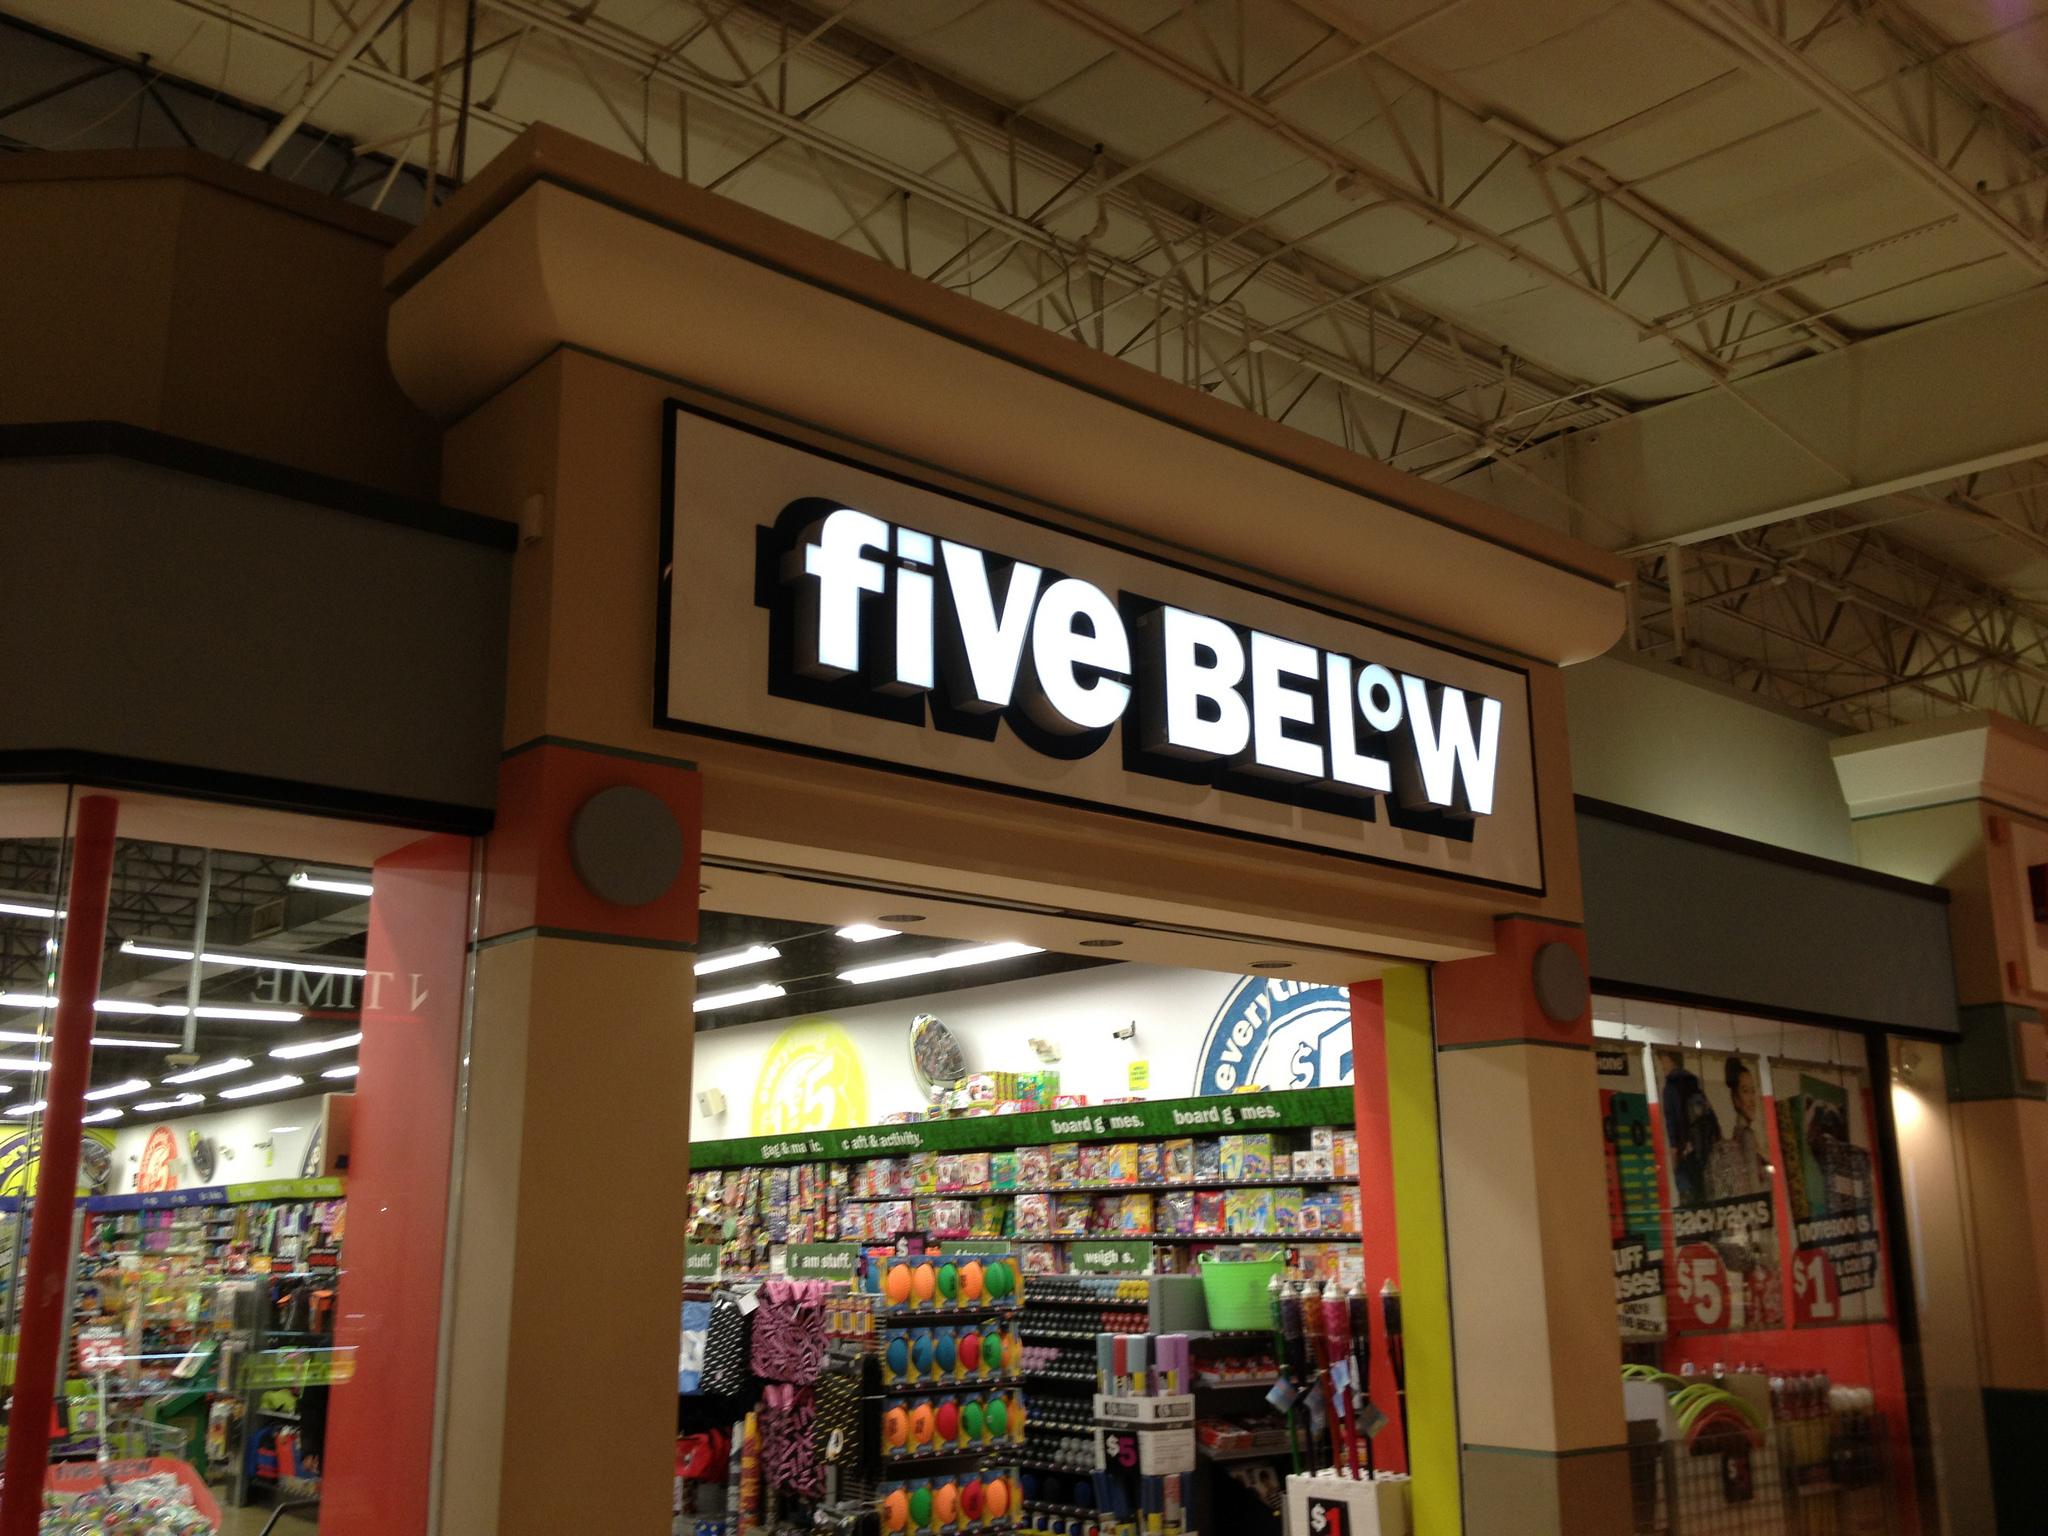 A Five Below store inside a mall